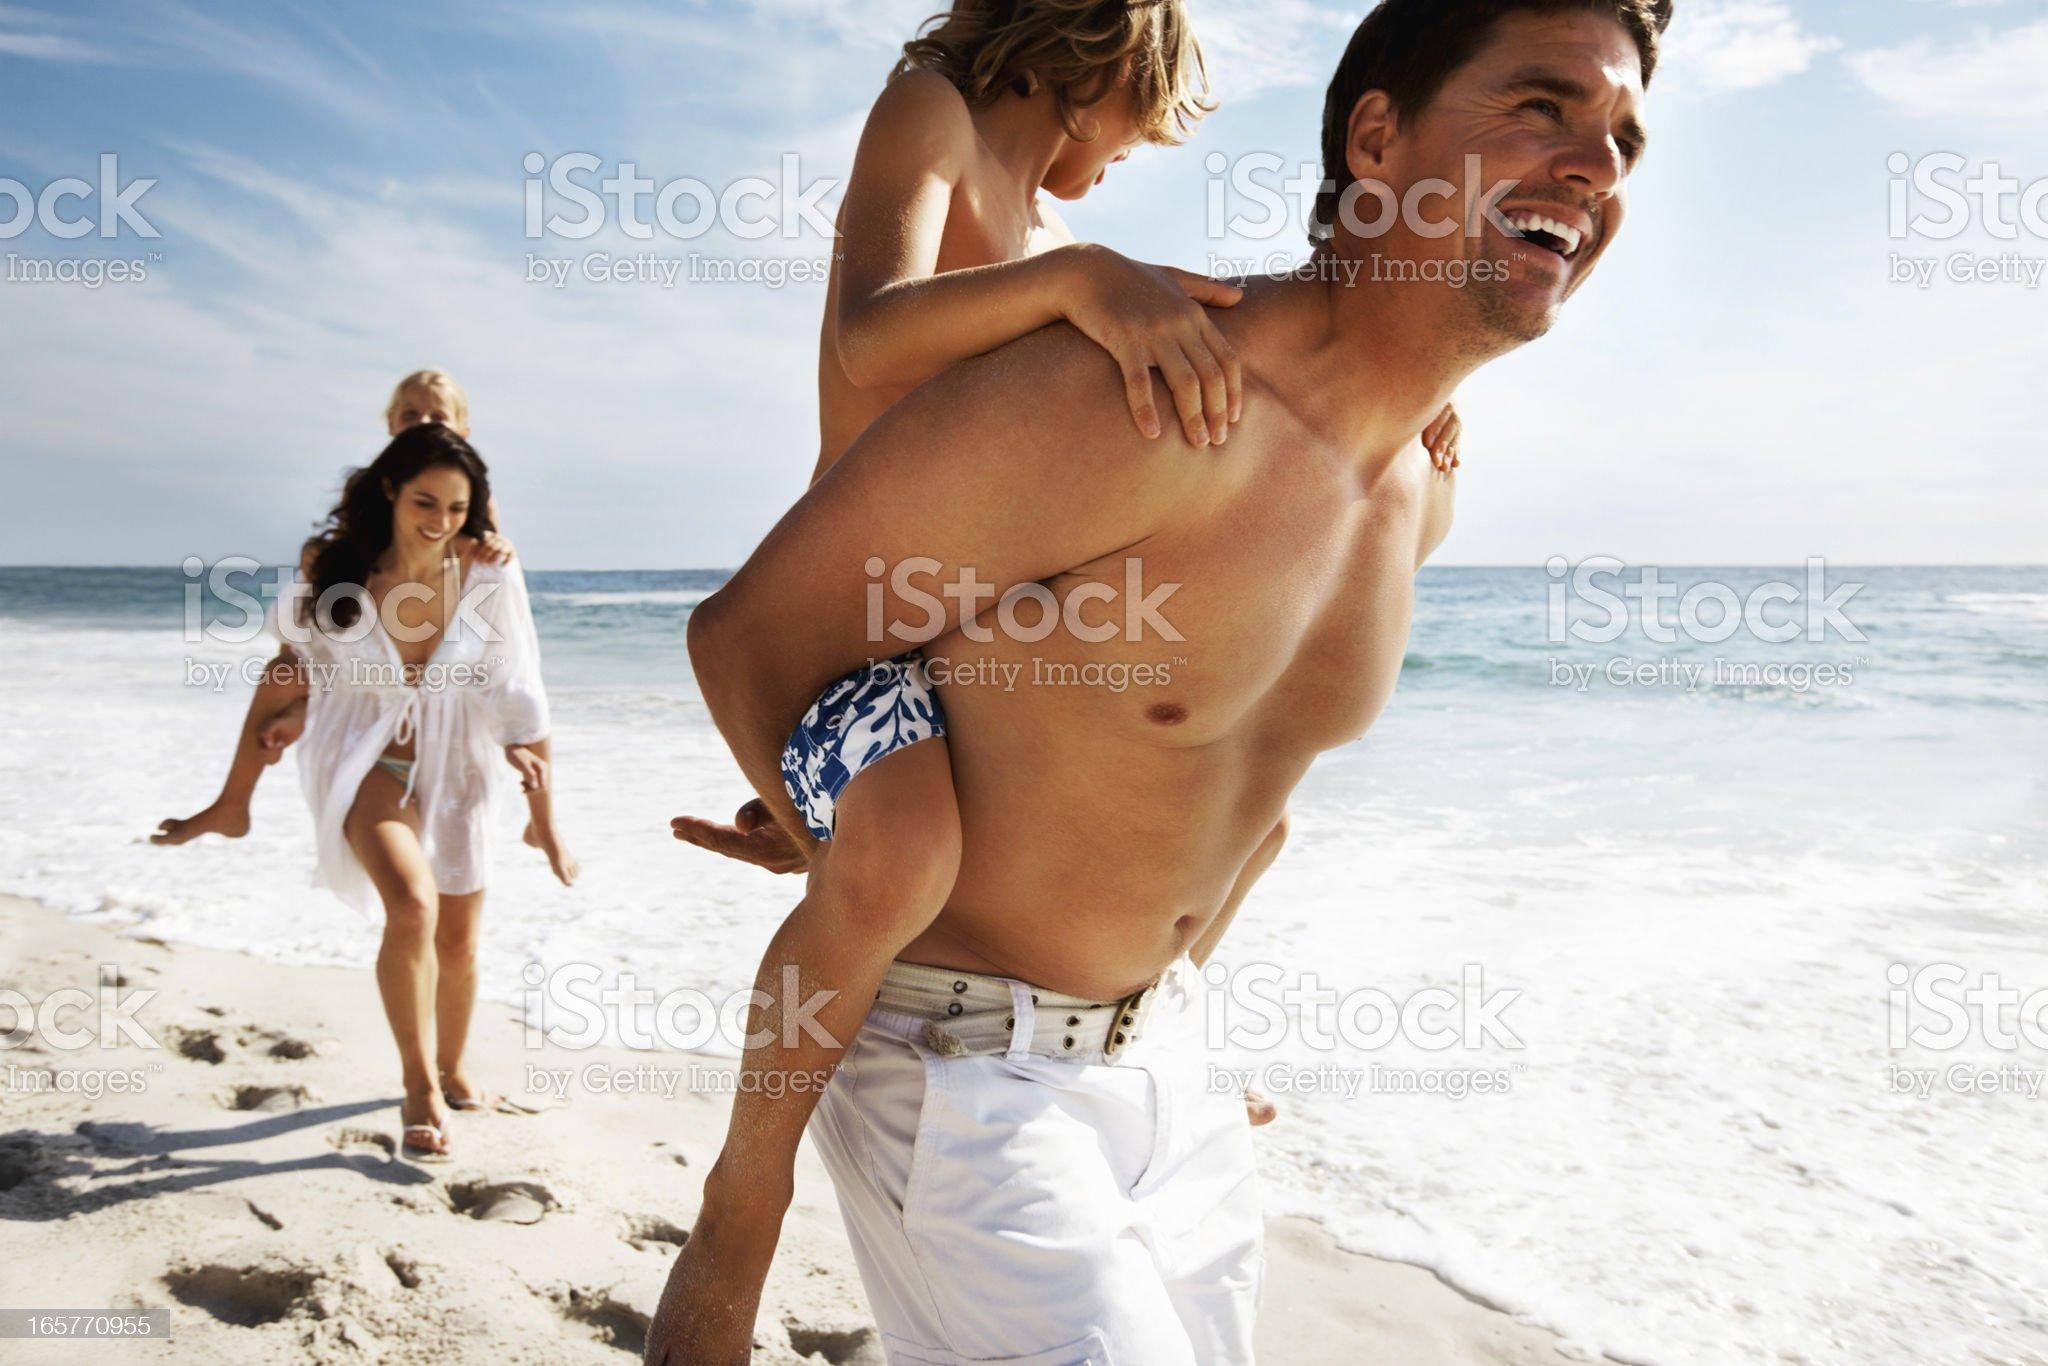 Kids enjoying piggy back rides on parents at the beach royalty-free stock photo